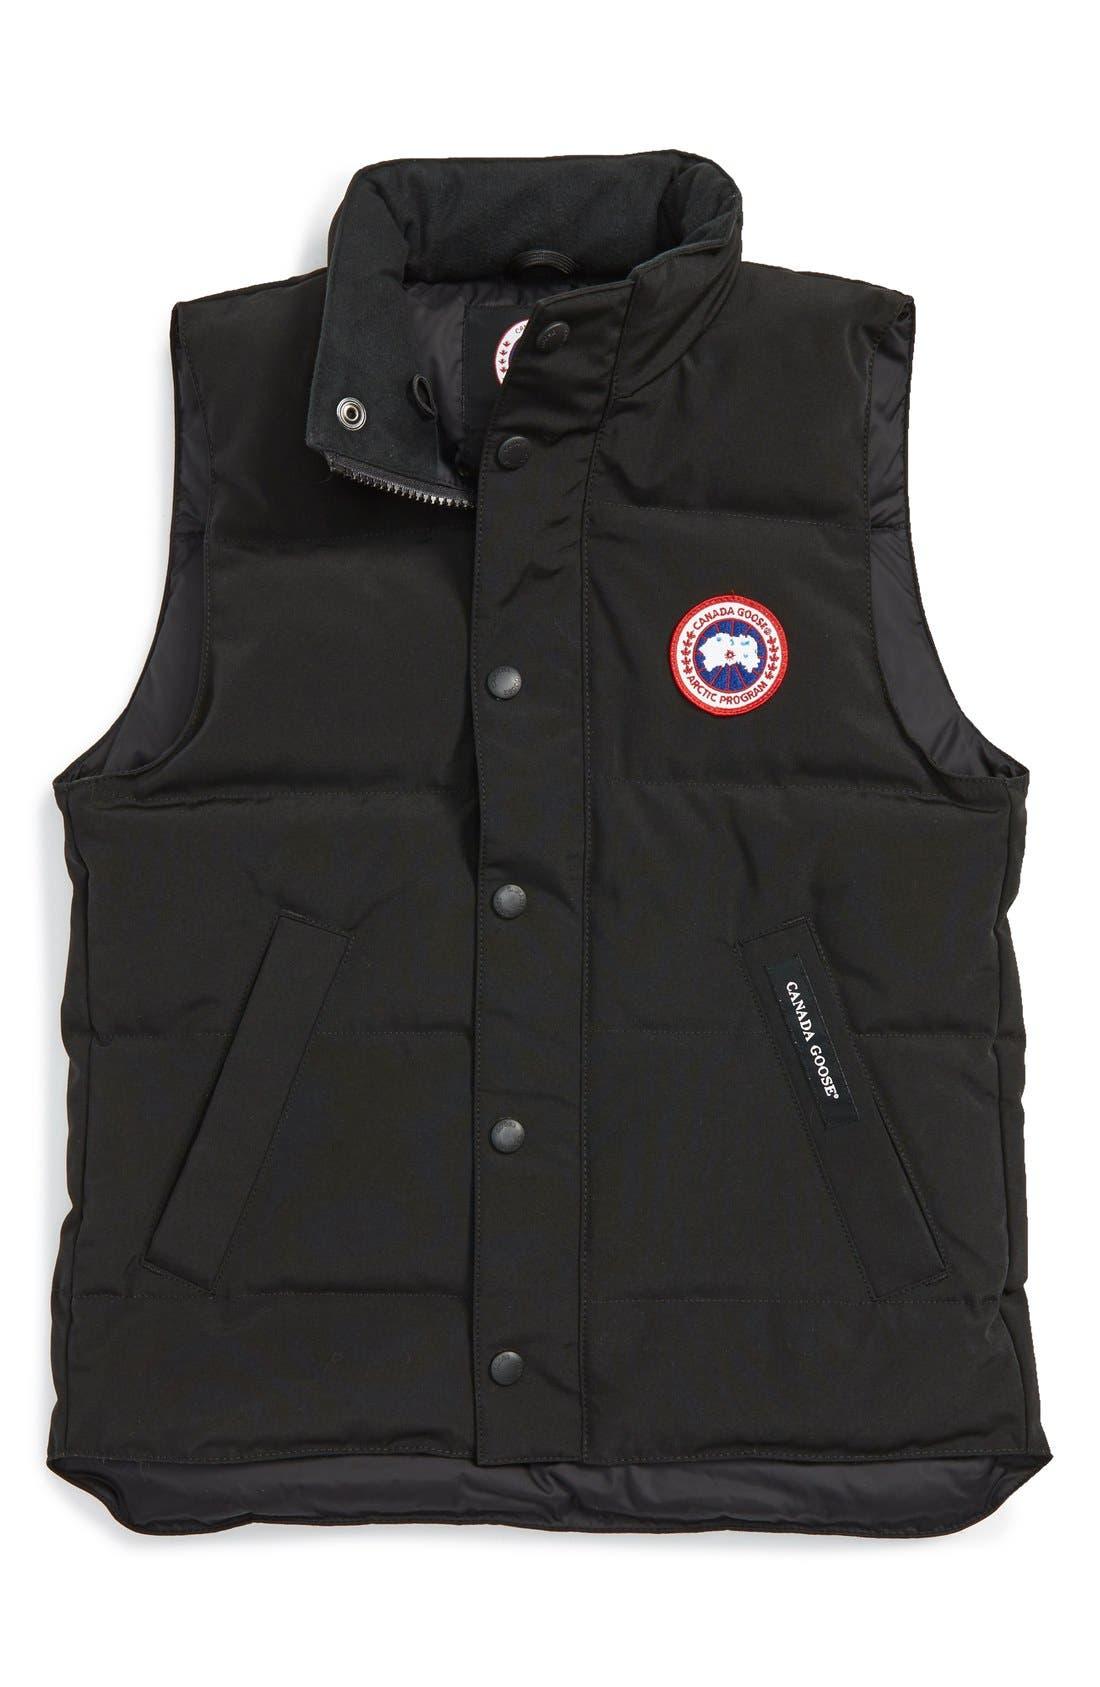 Alternate Image 1 Selected - Canada Goose 'Vanier' Down Vest (Little Boys & Big Boys)